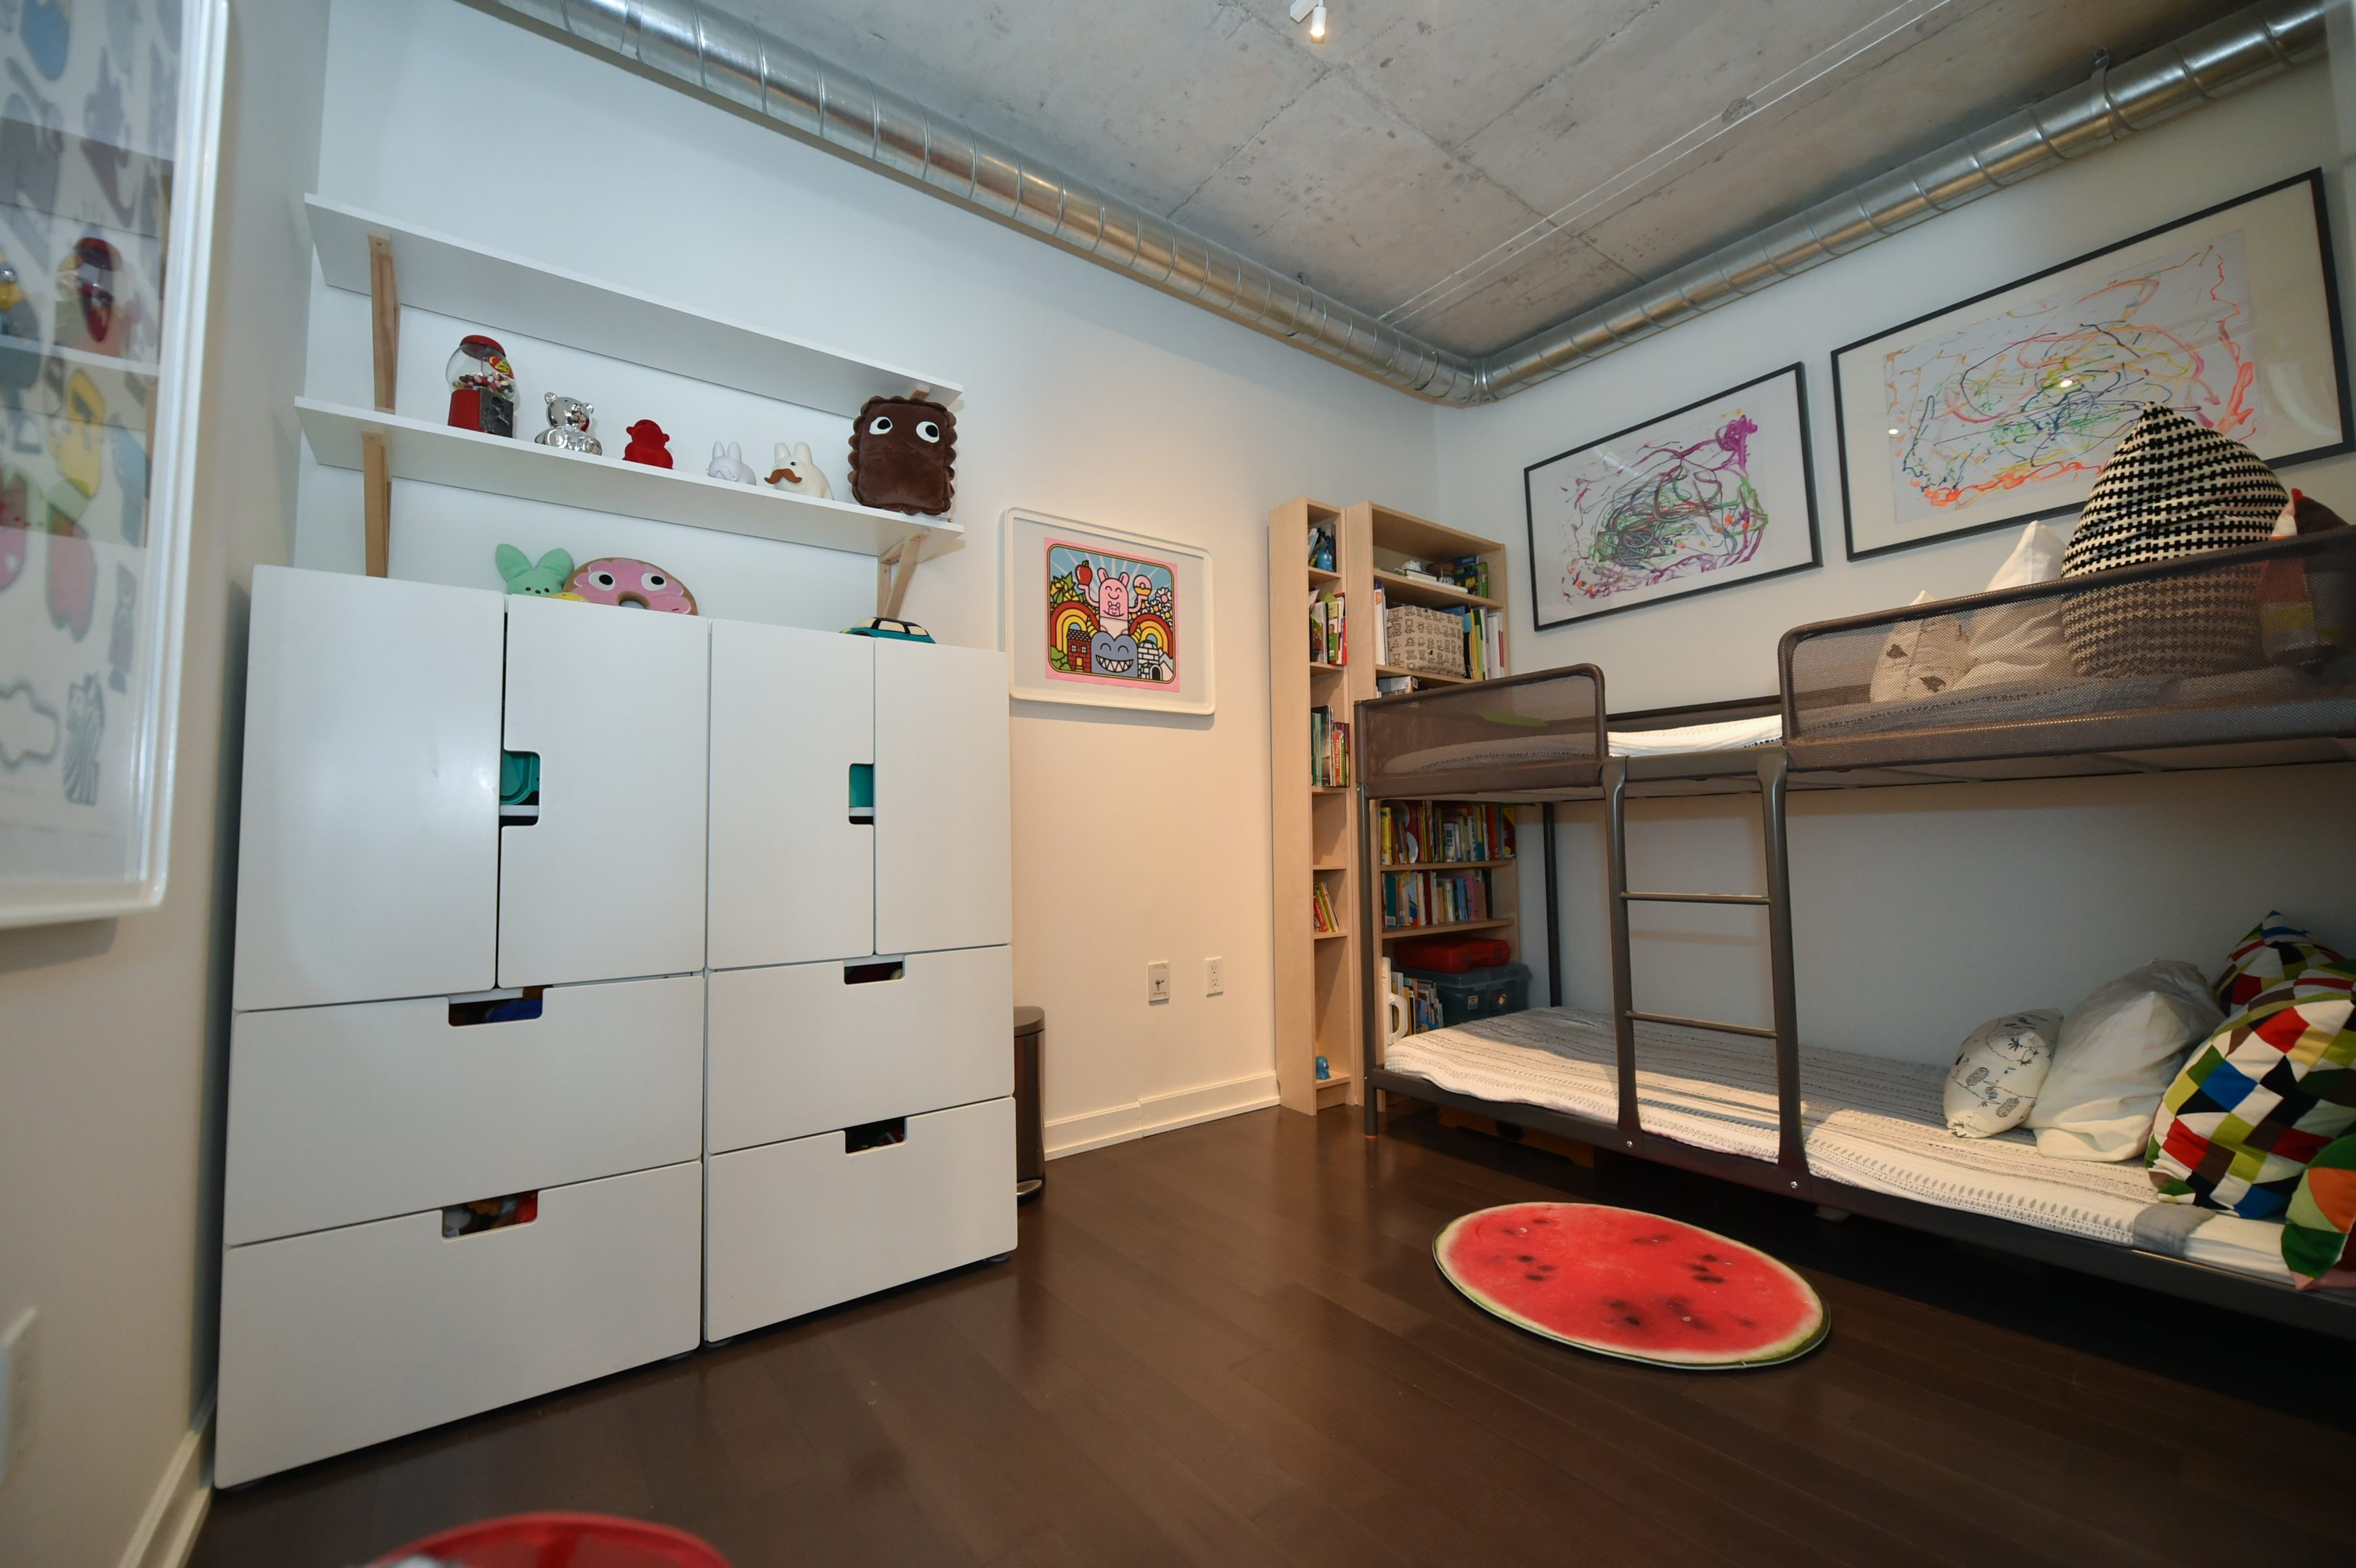 toronto-apartment-for-rent-533-richmond-street-west-4